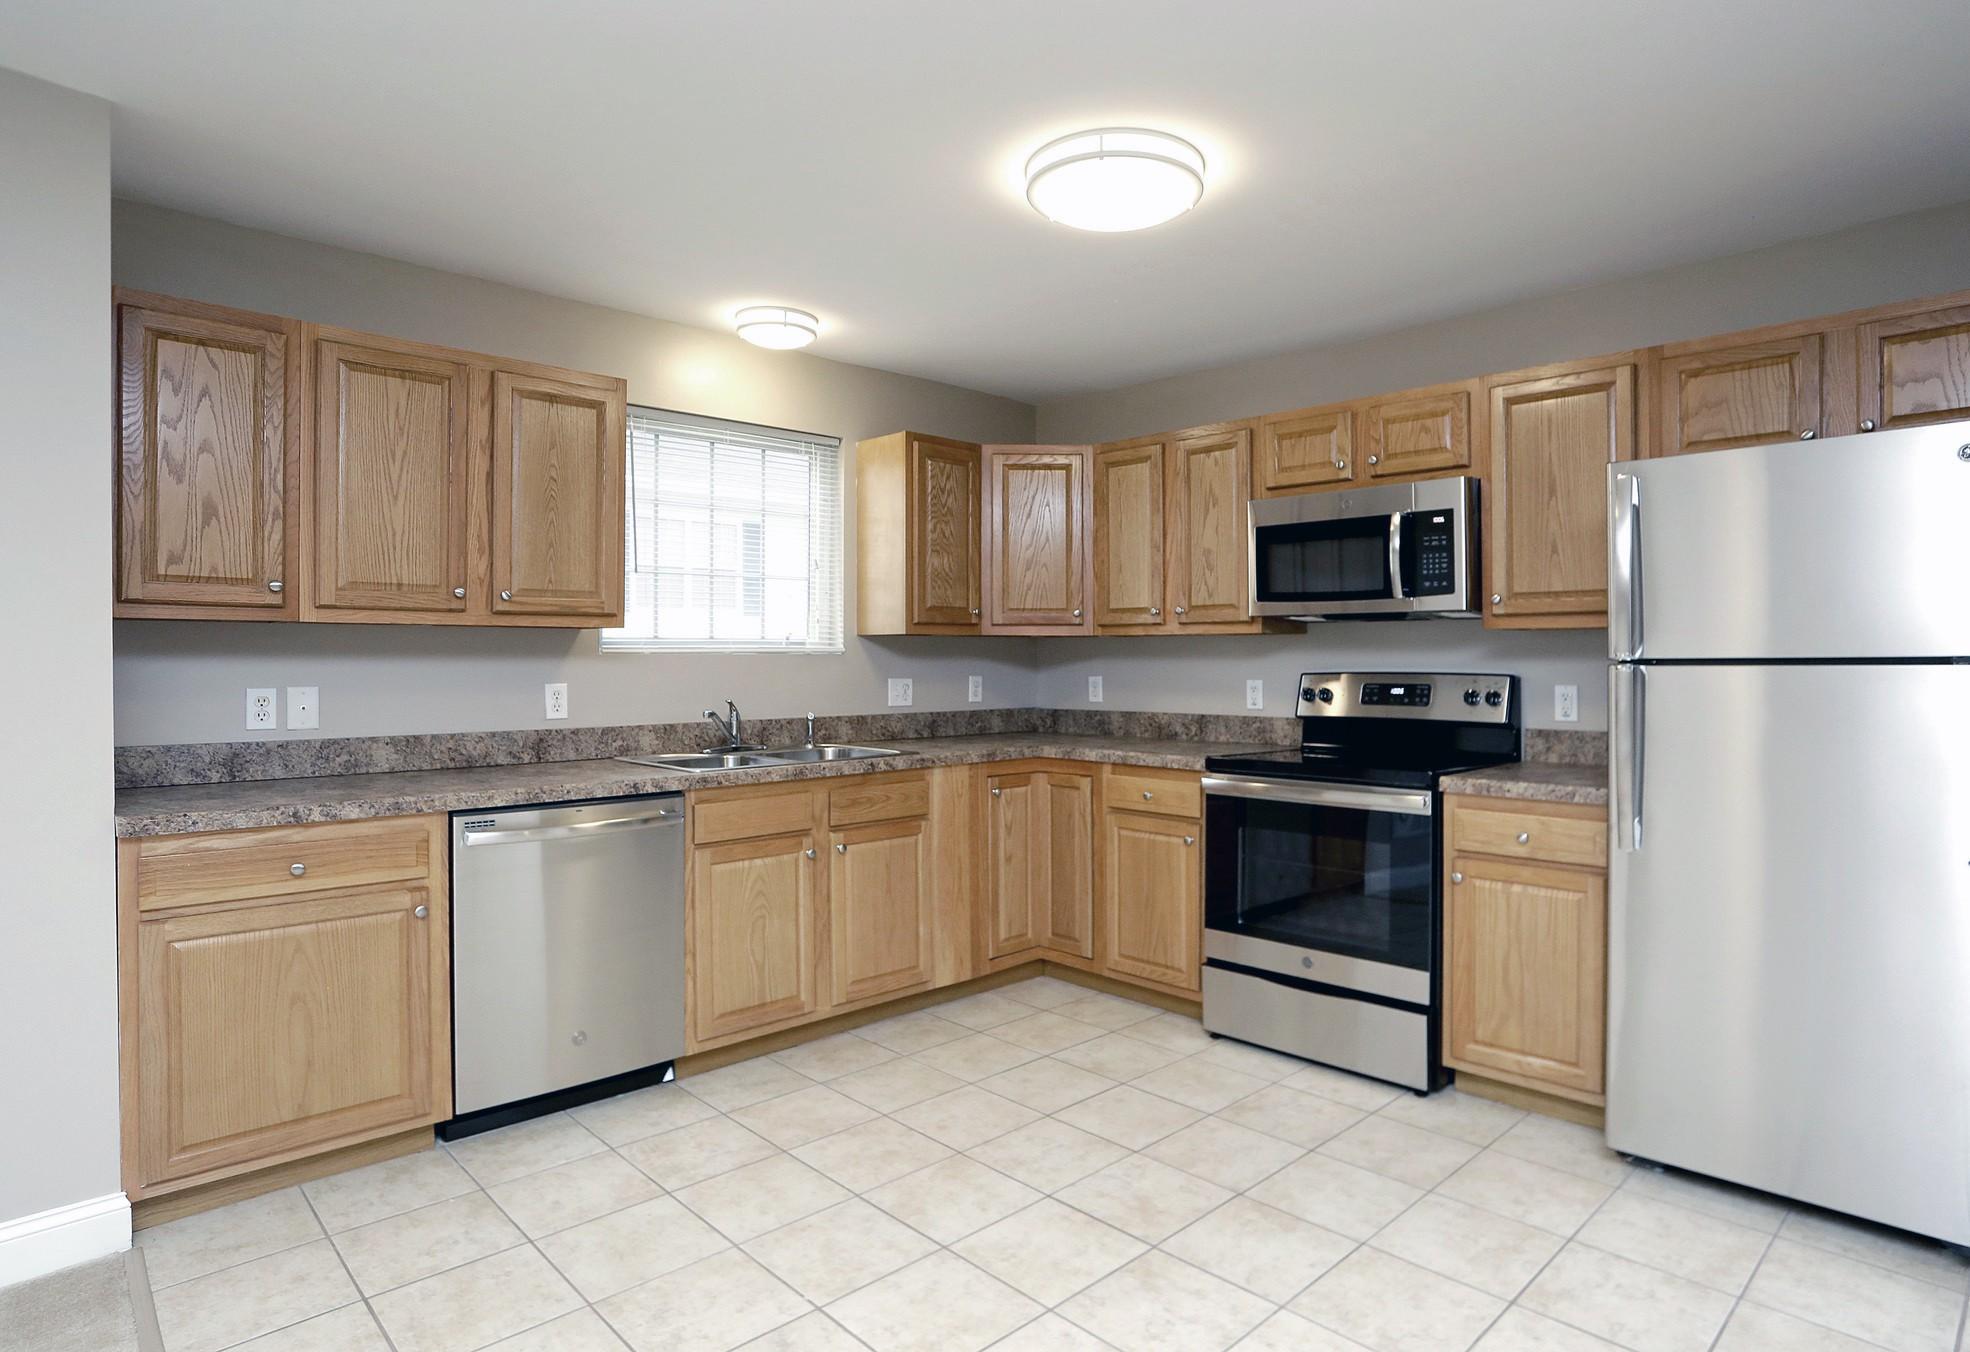 Apartments Near Merrimack Abbott Landing for Merrimack College Students in North Andover, MA